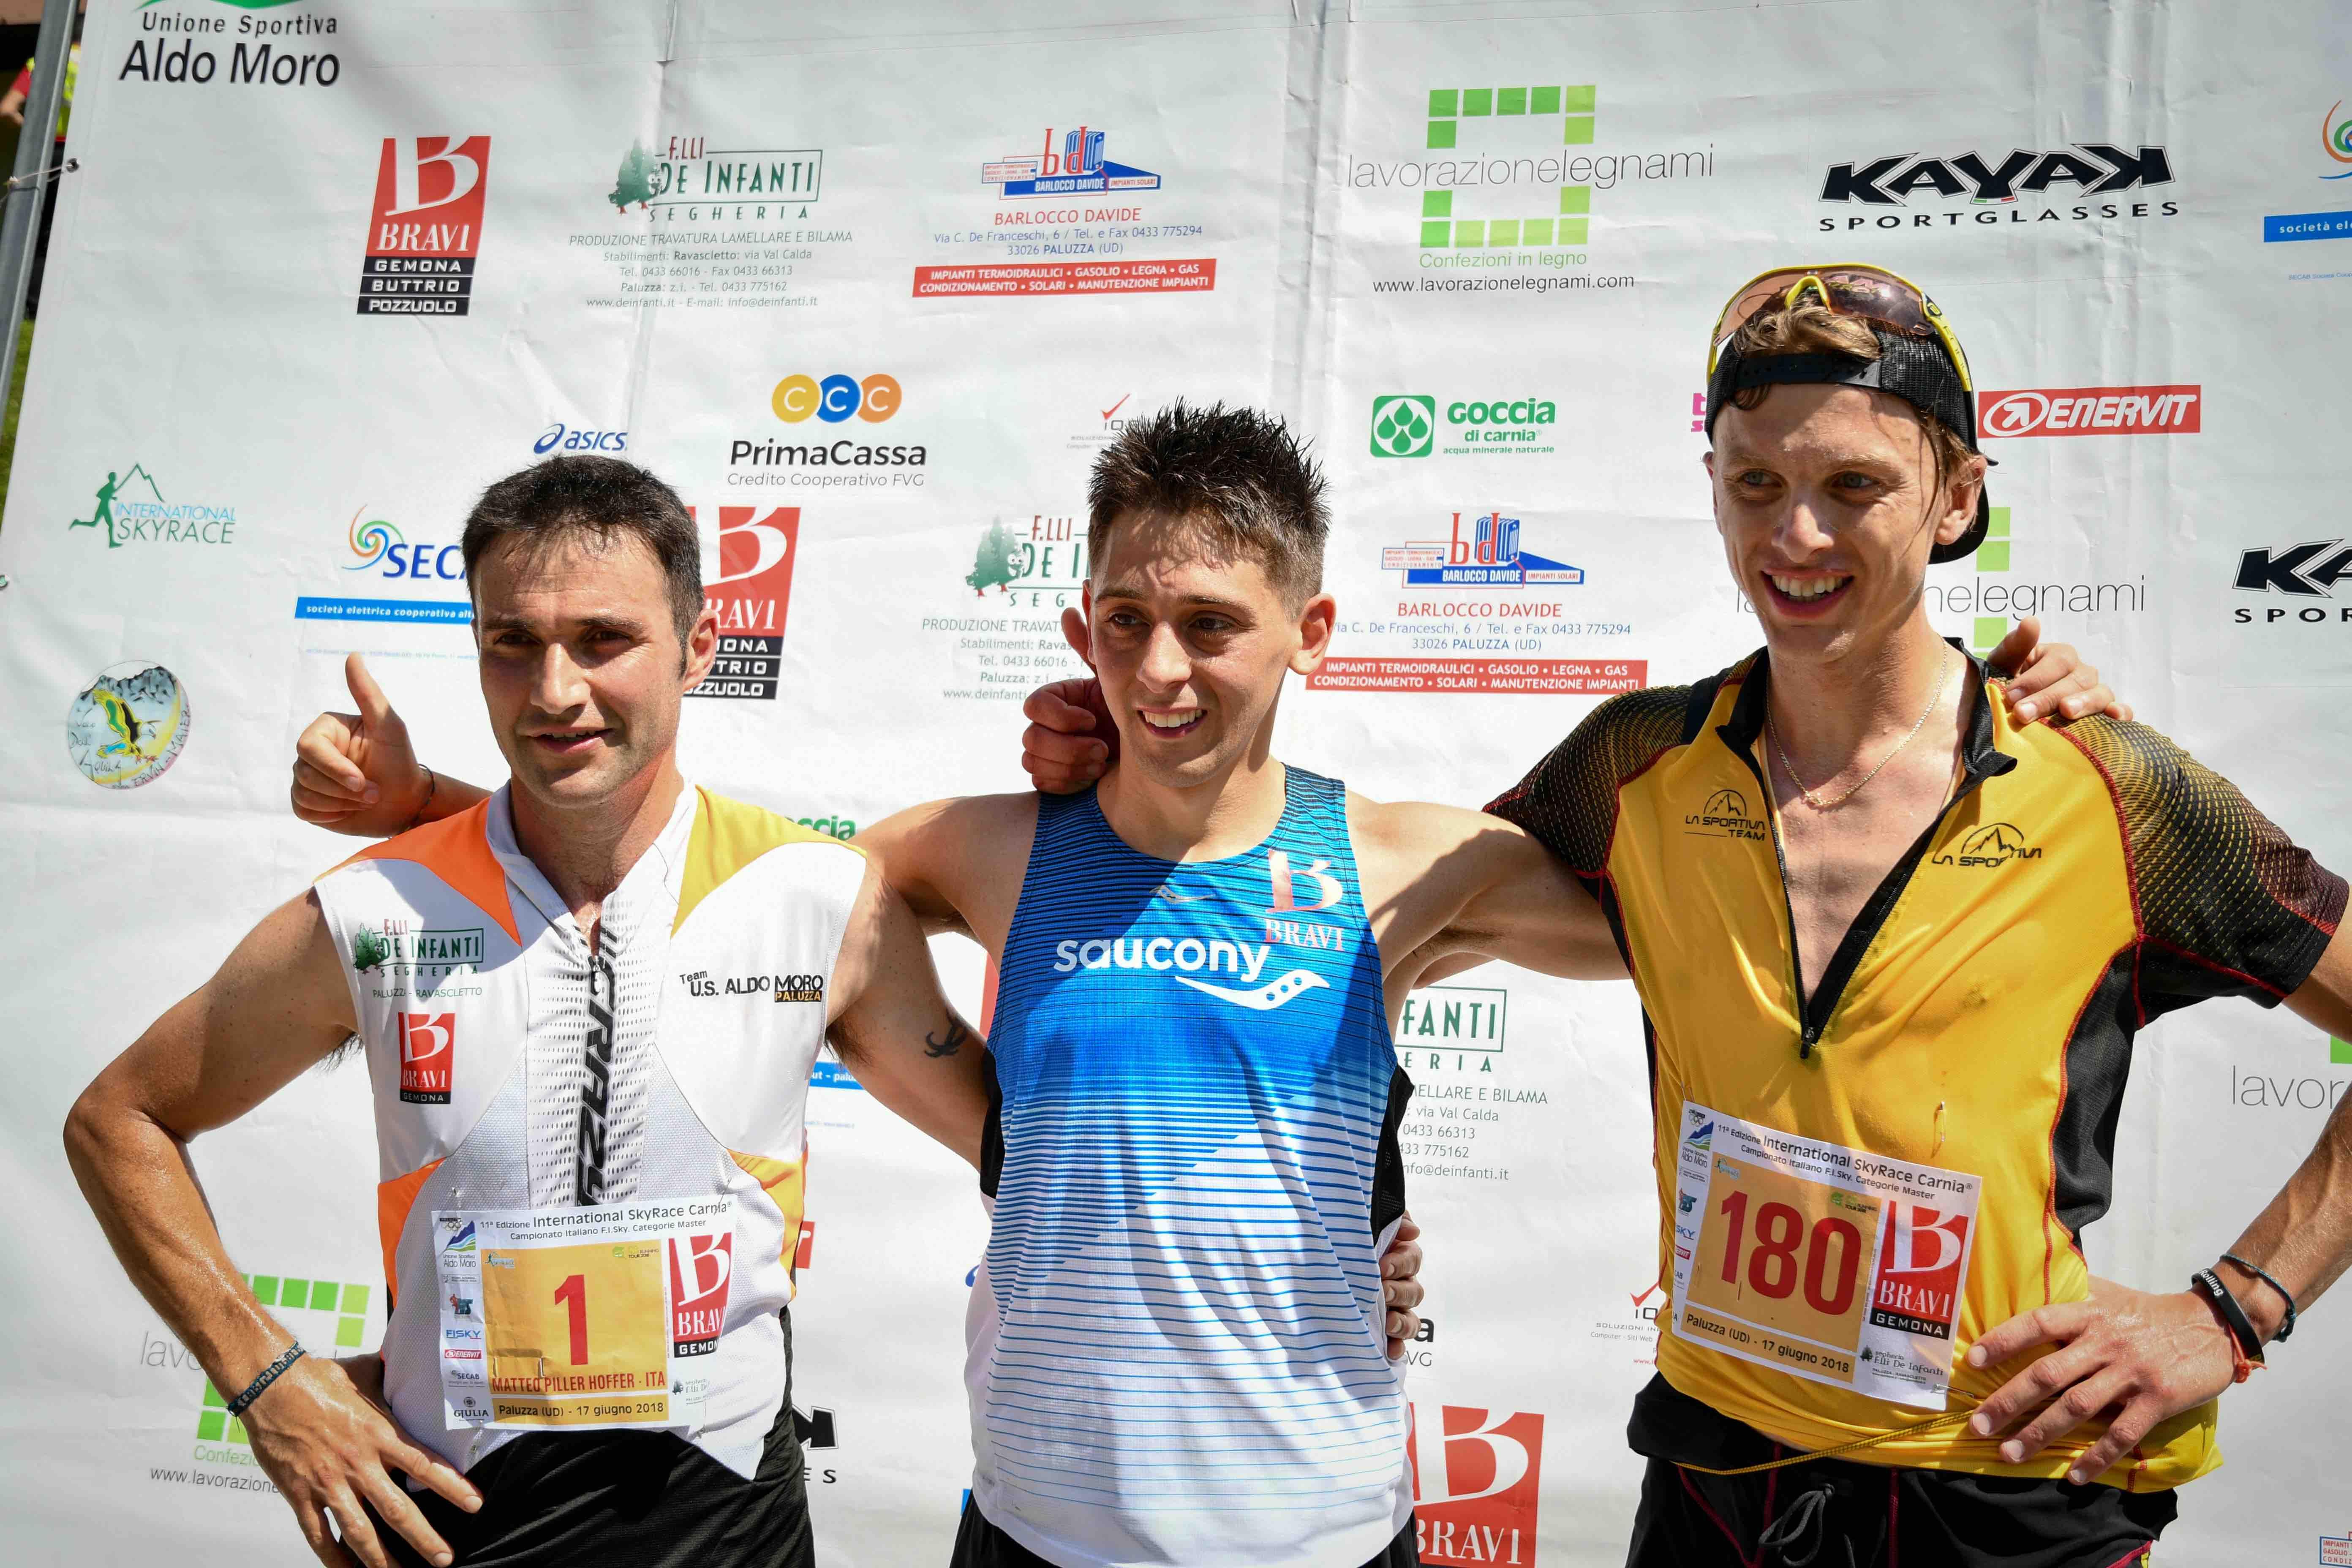 Sky Race Carnia - Il podio maschile 2018